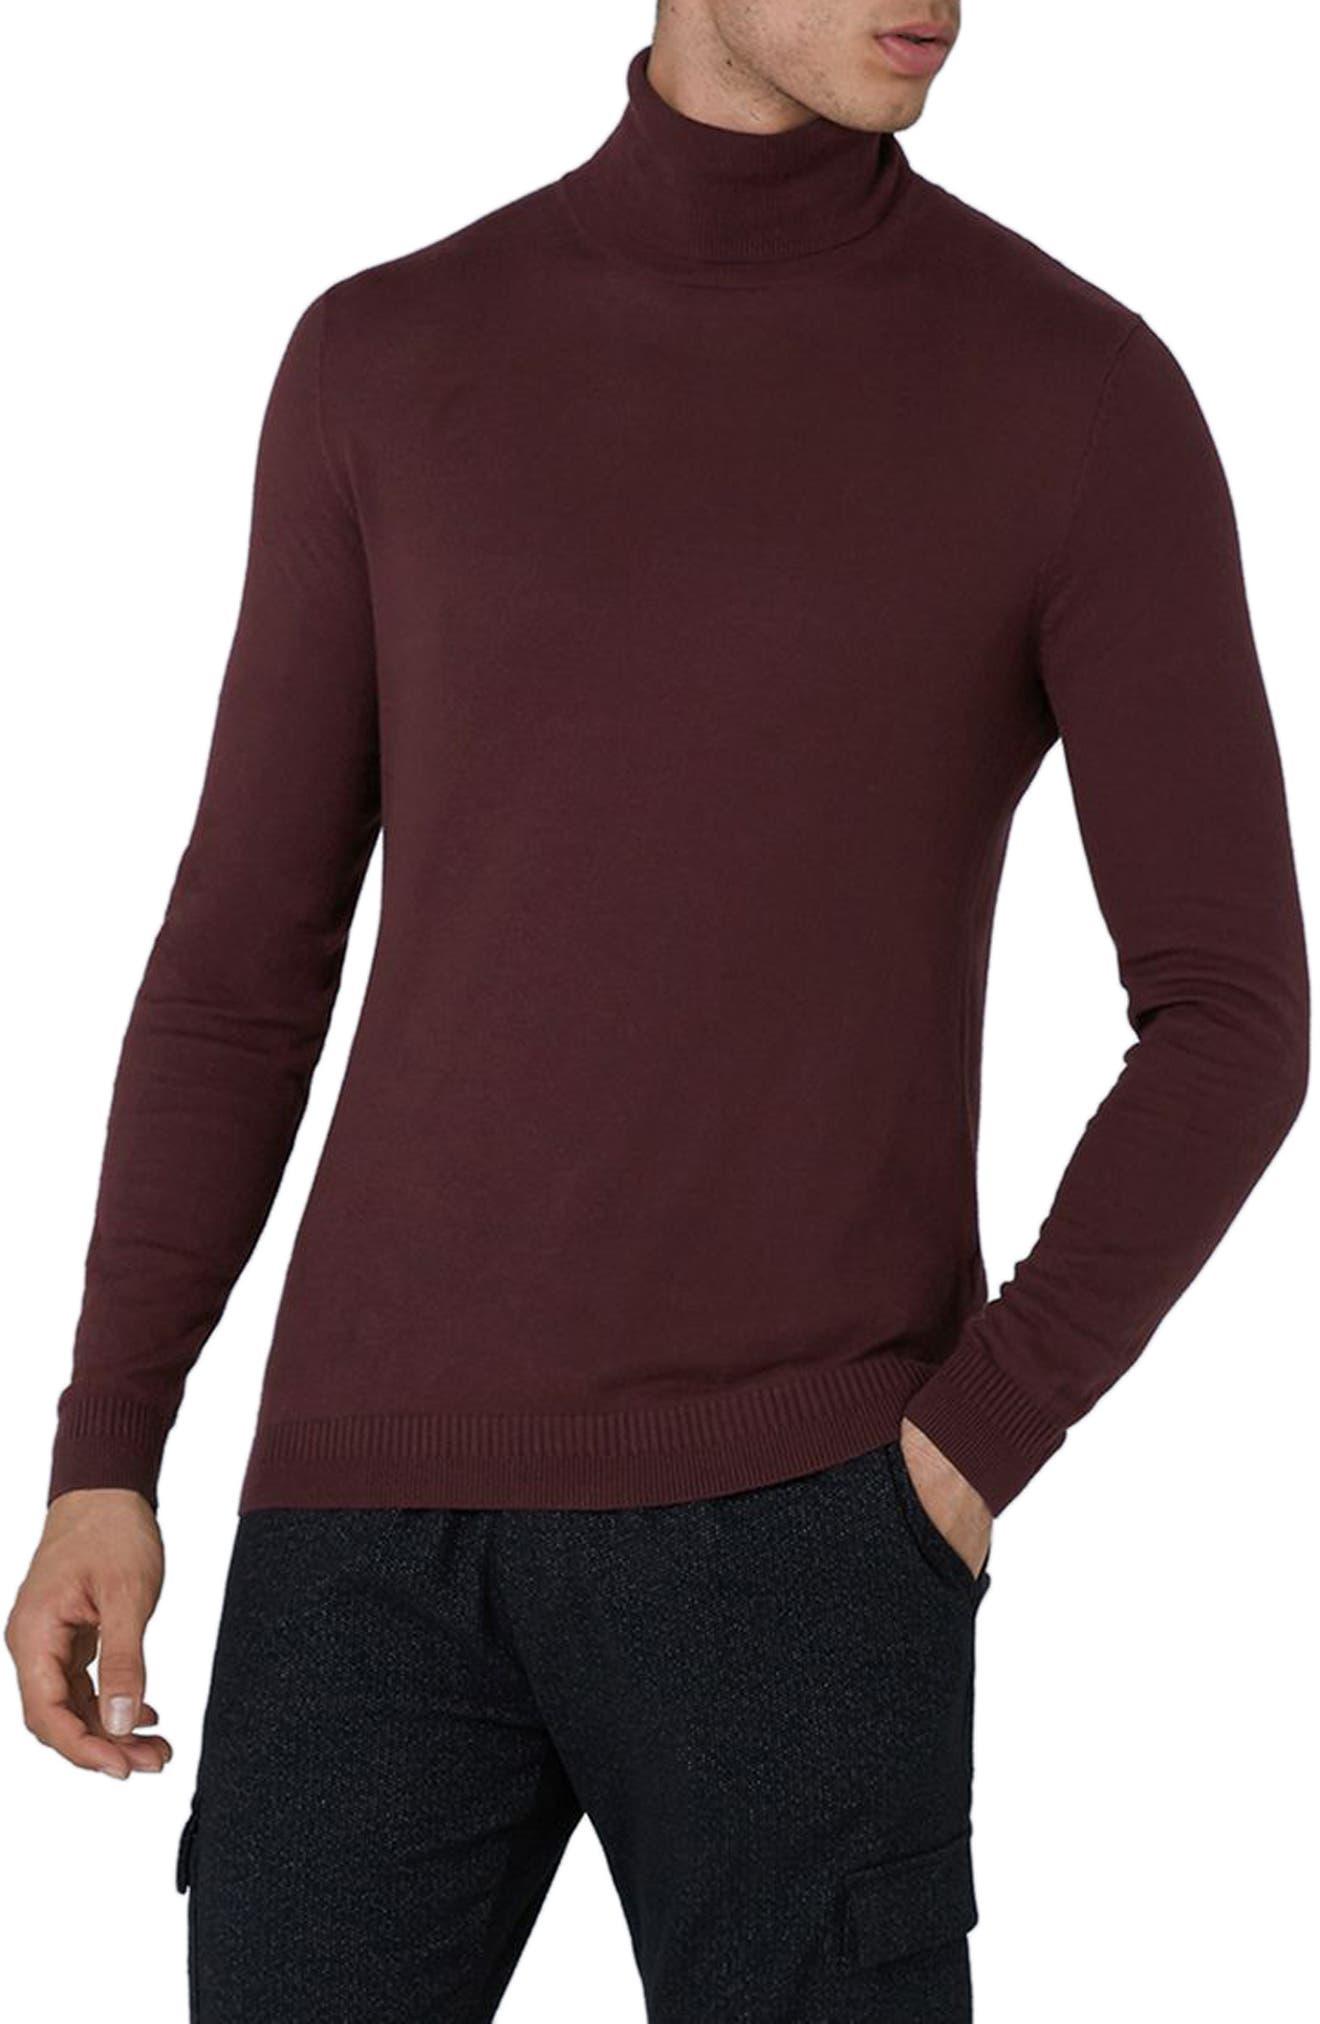 Topman Cotton Turtleneck Sweater